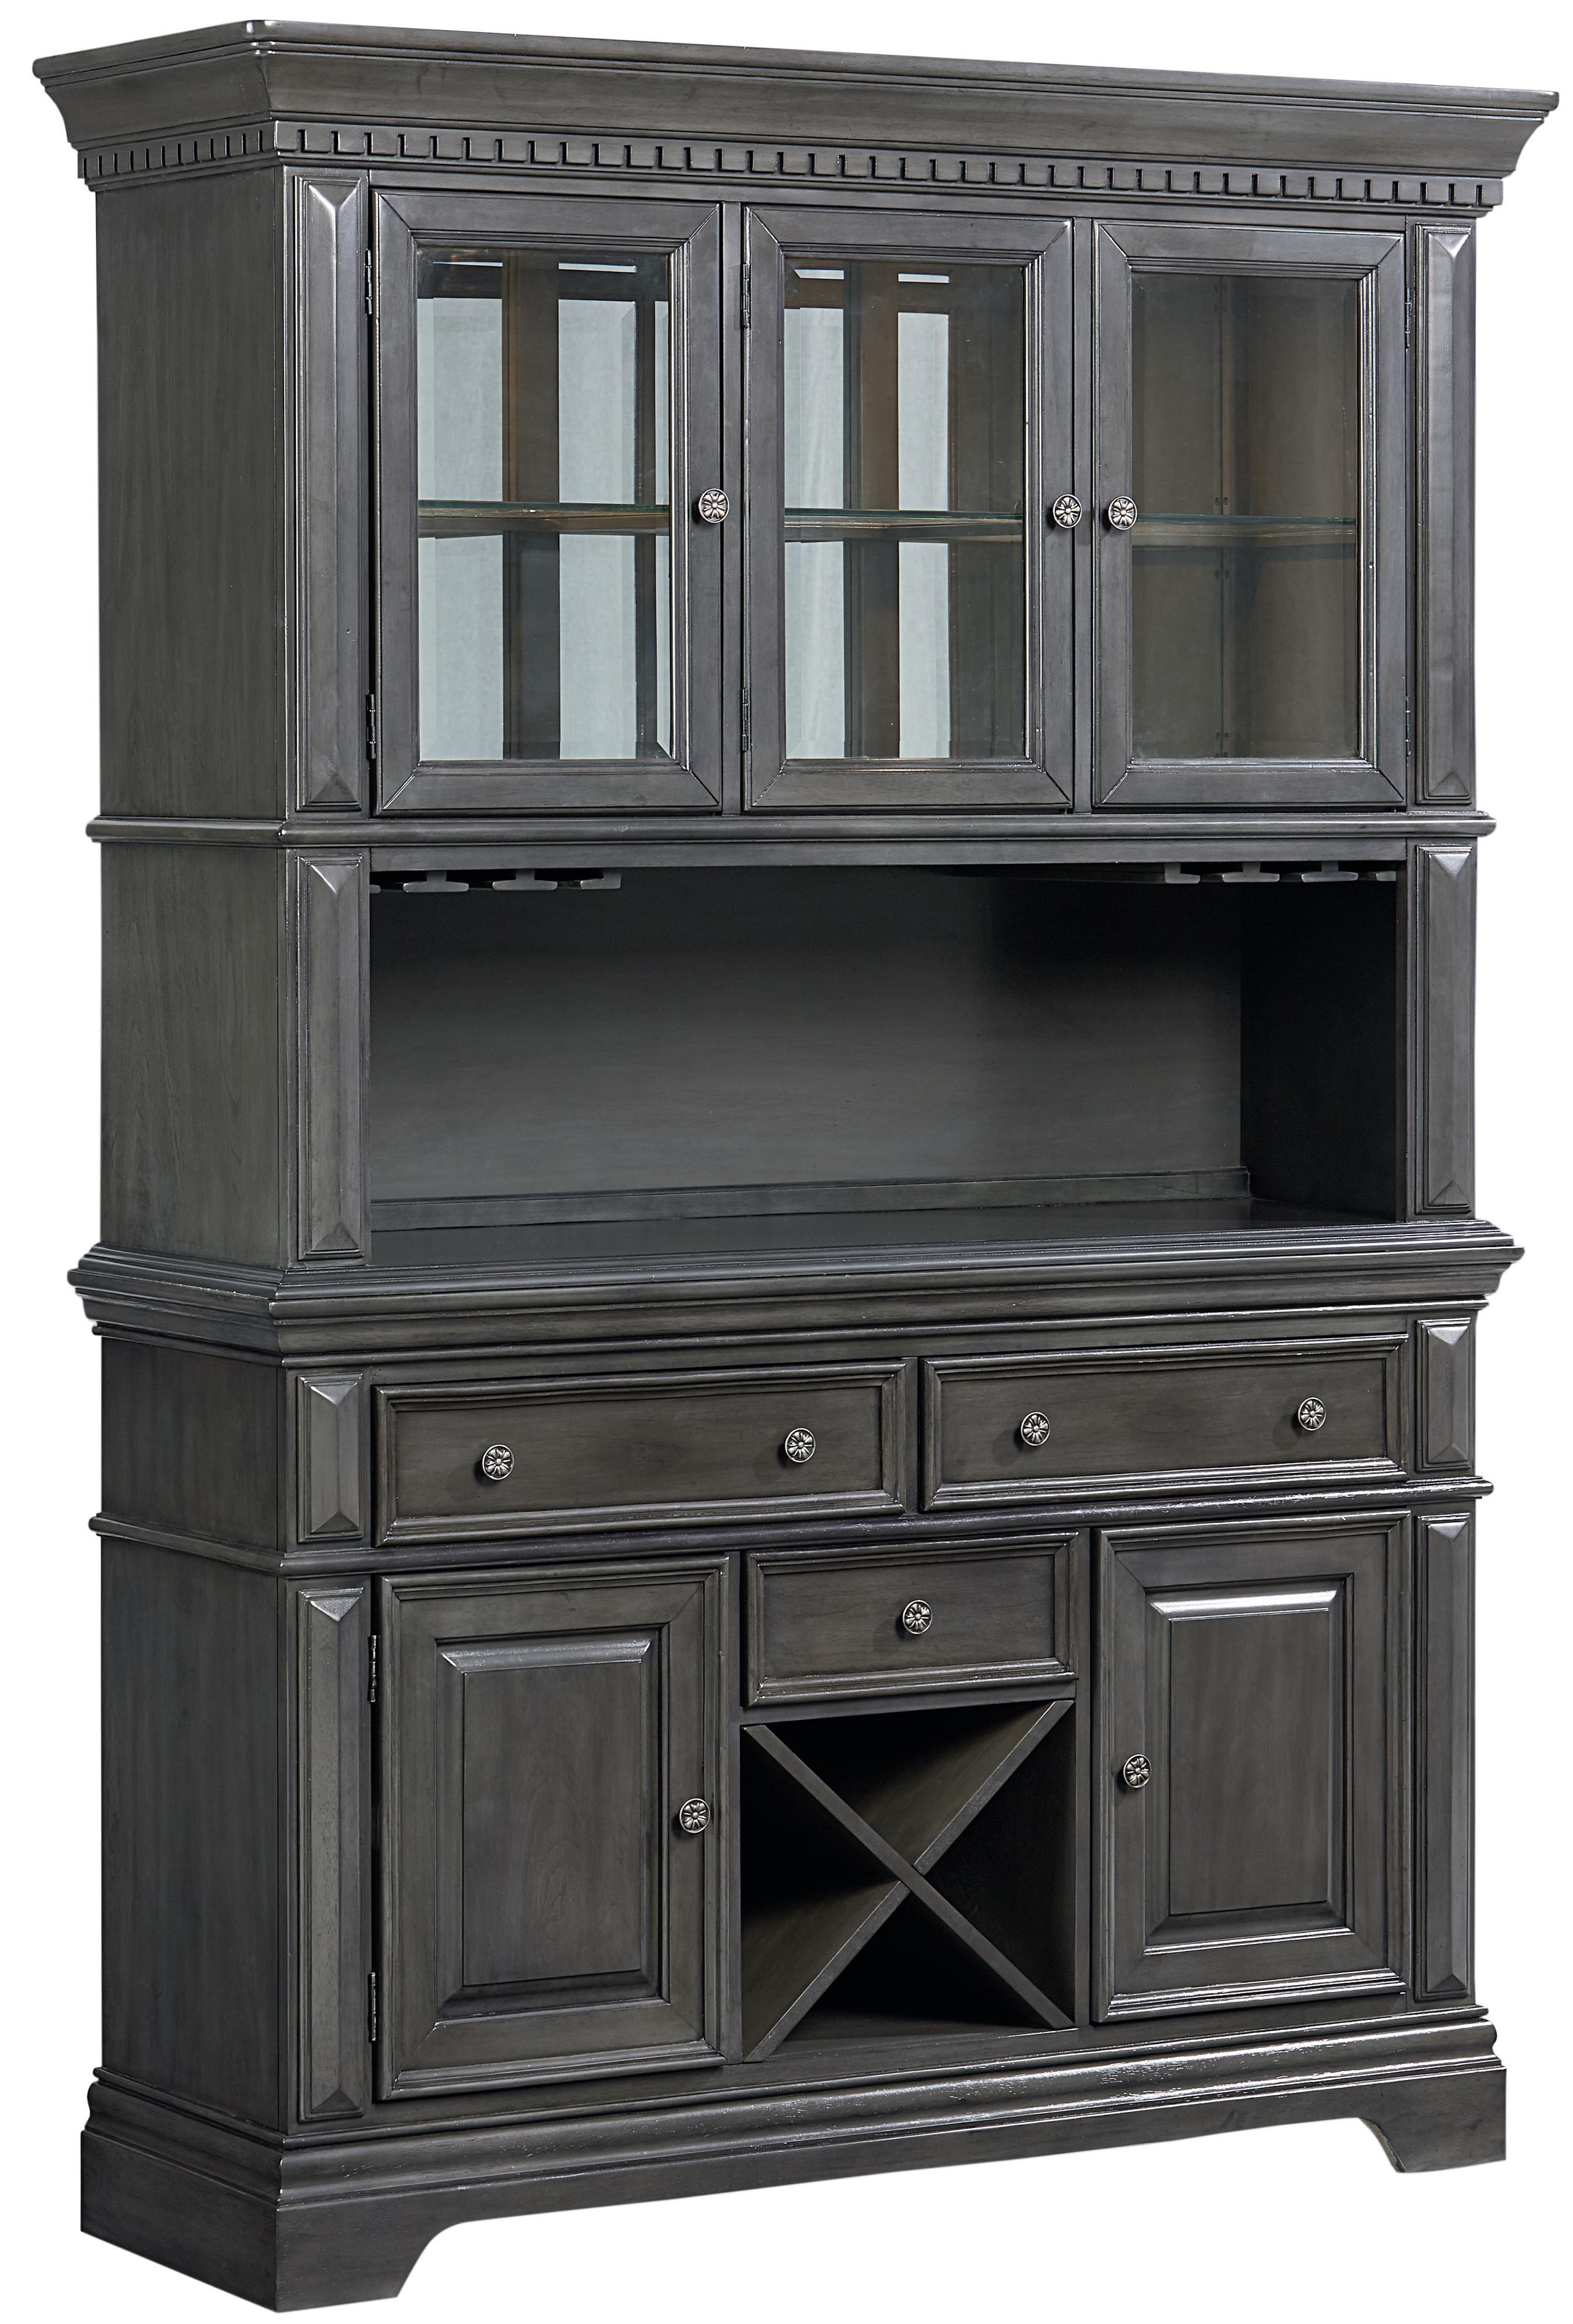 Standard Furniture Garrison Traditionally Styled China